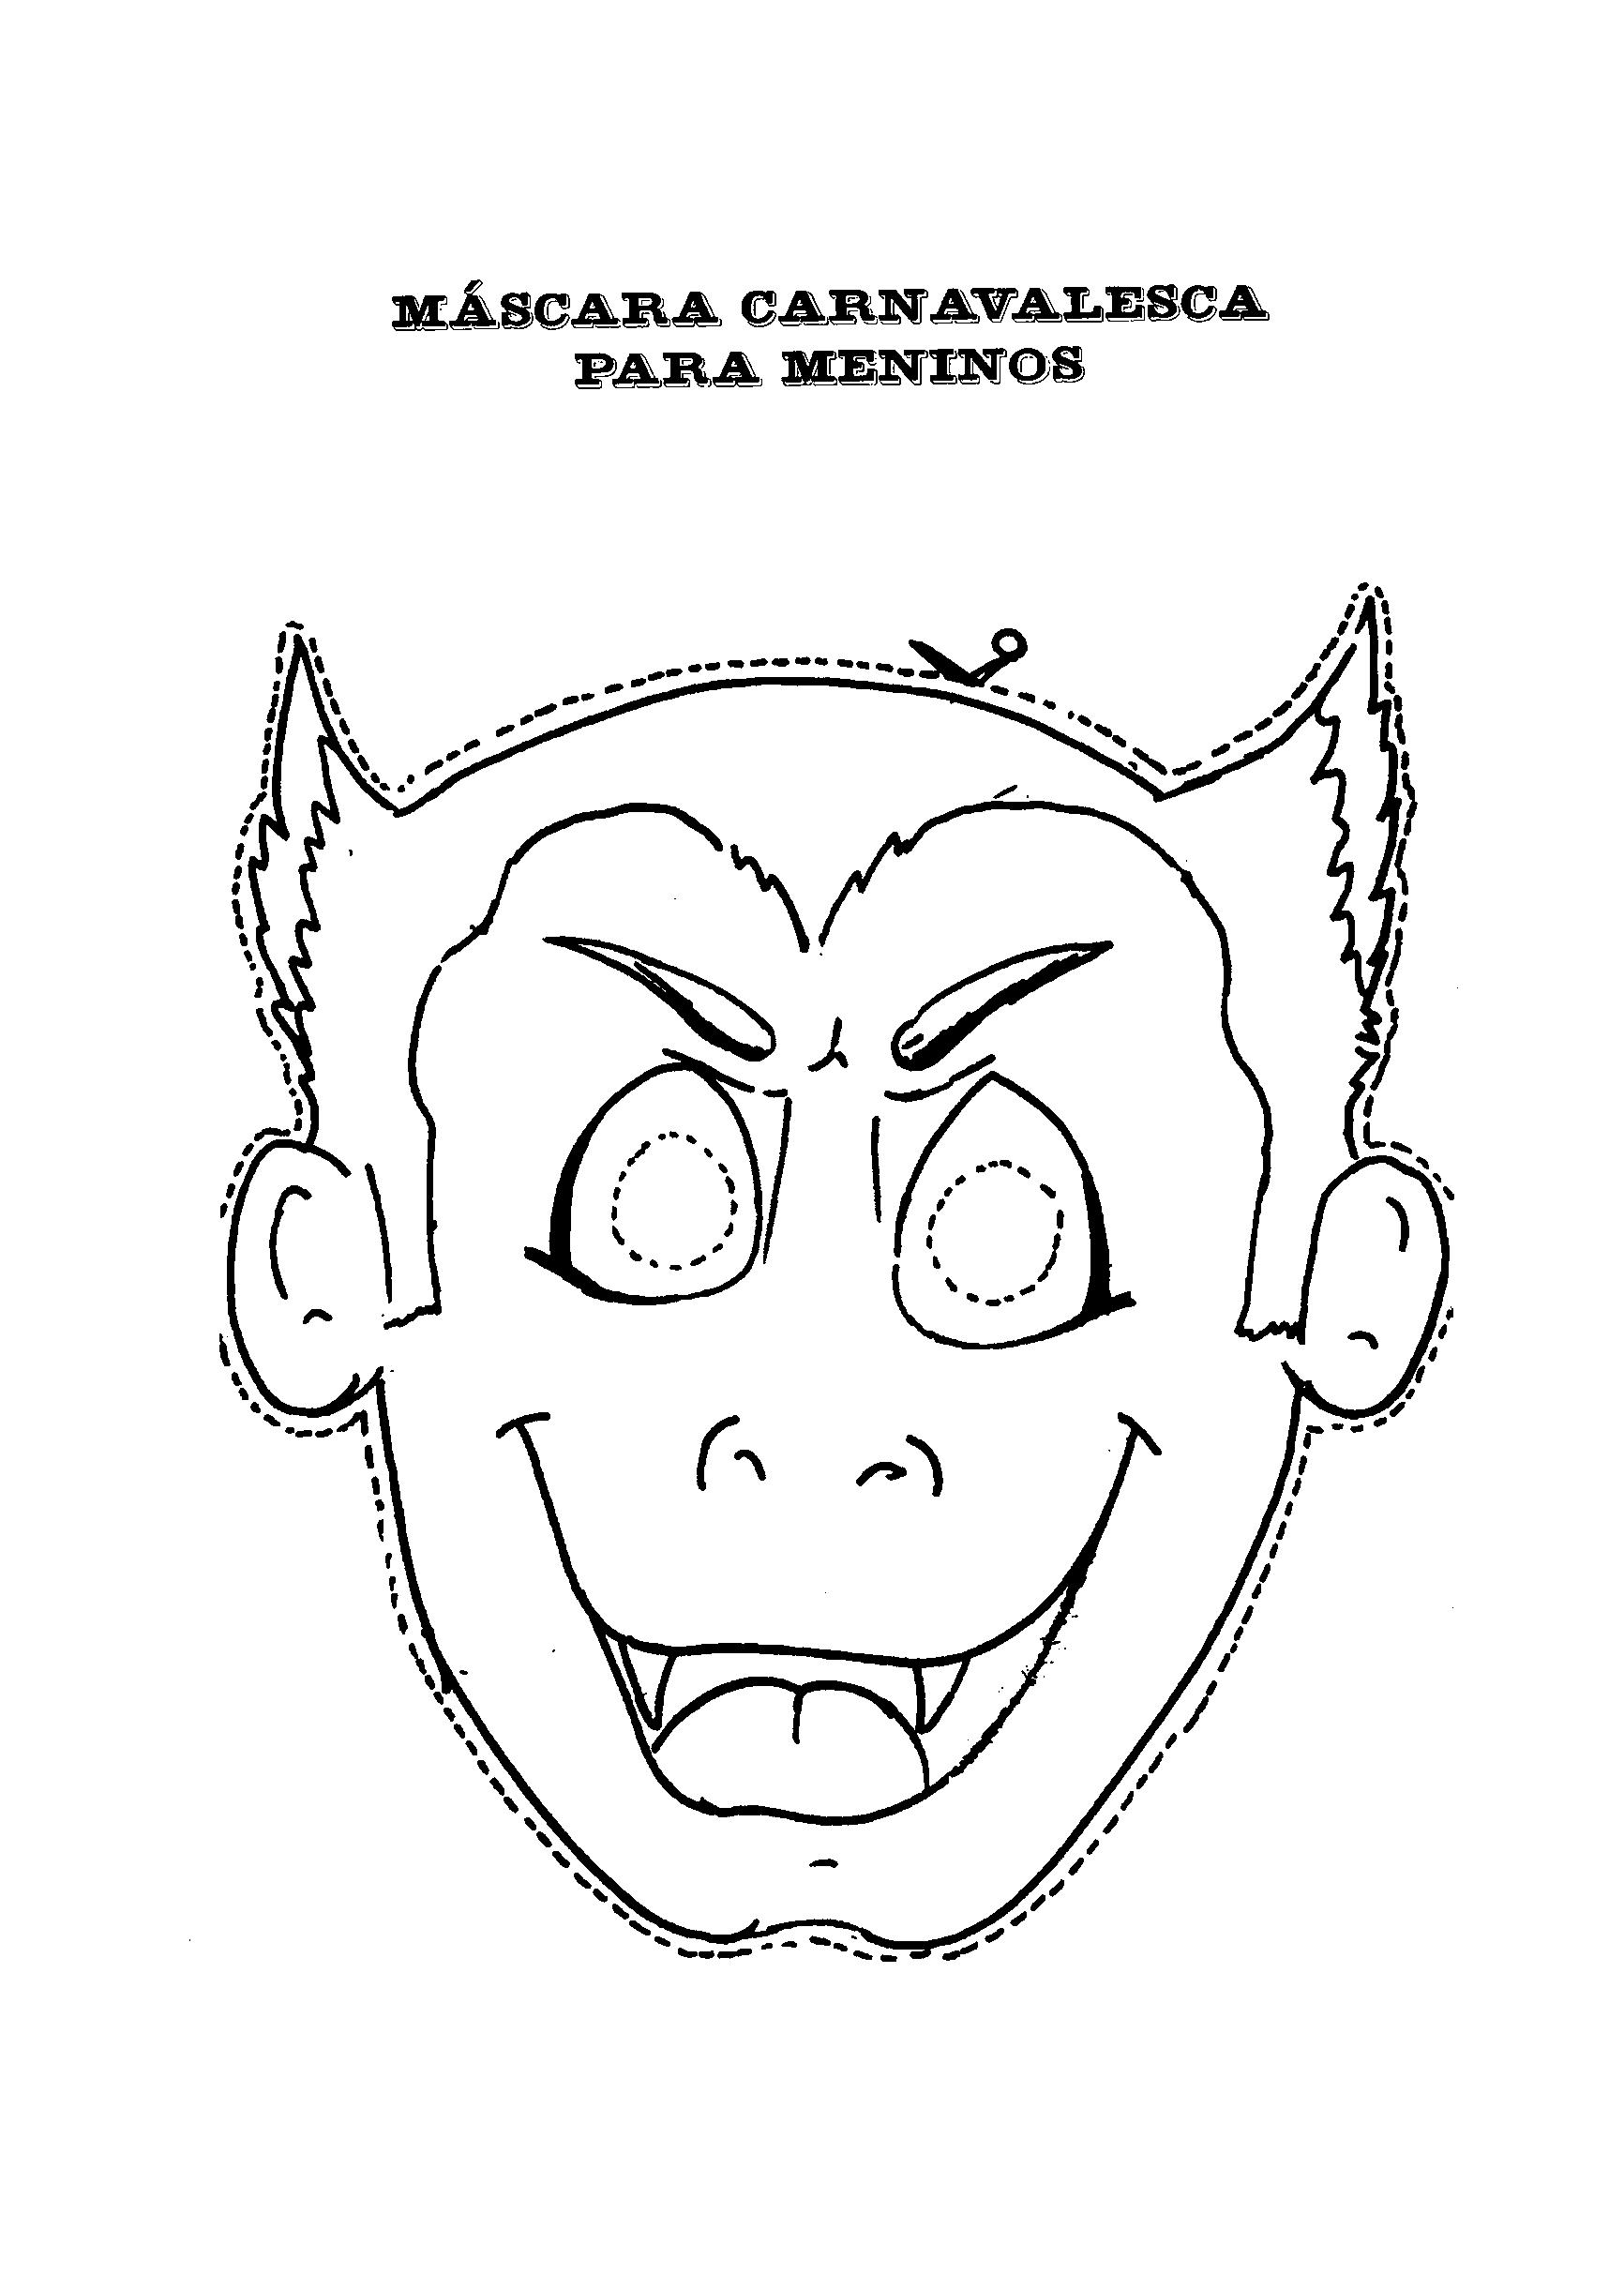 0272-mascara-carnaval-diabinho